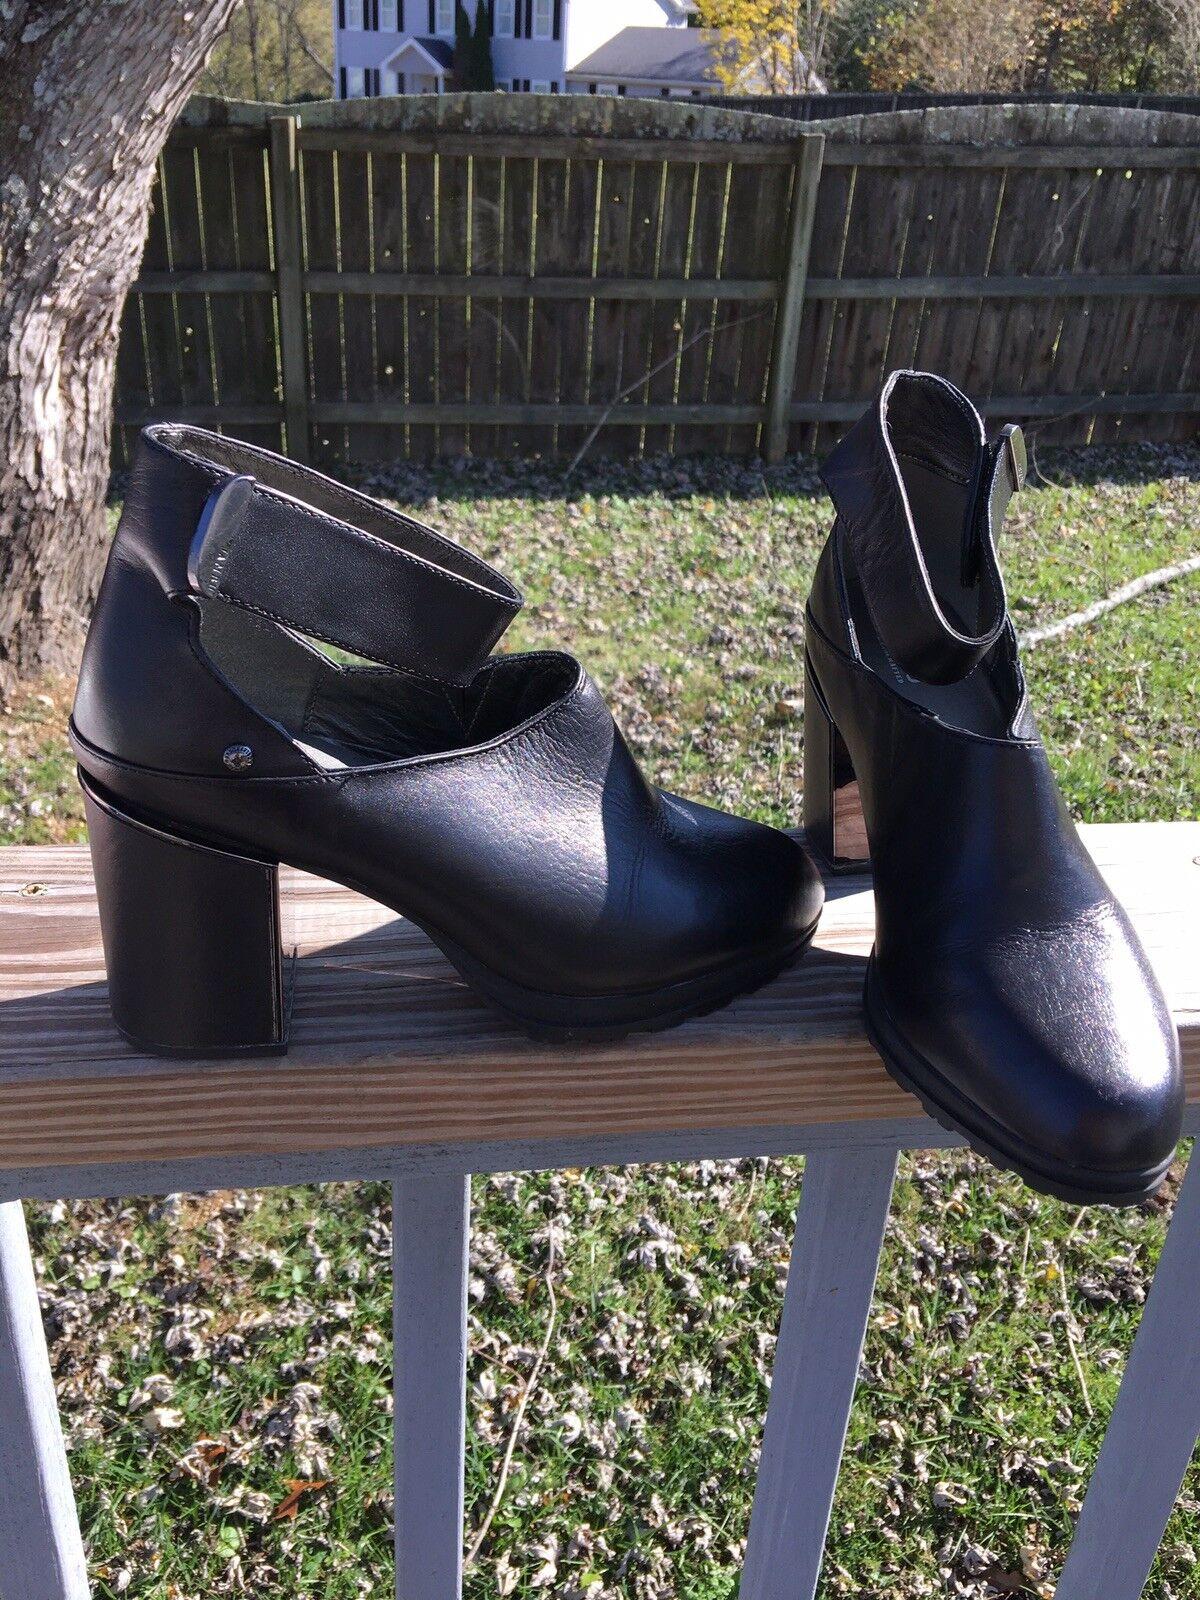 Jambu Canary Heels - Women's Size 8M - Black